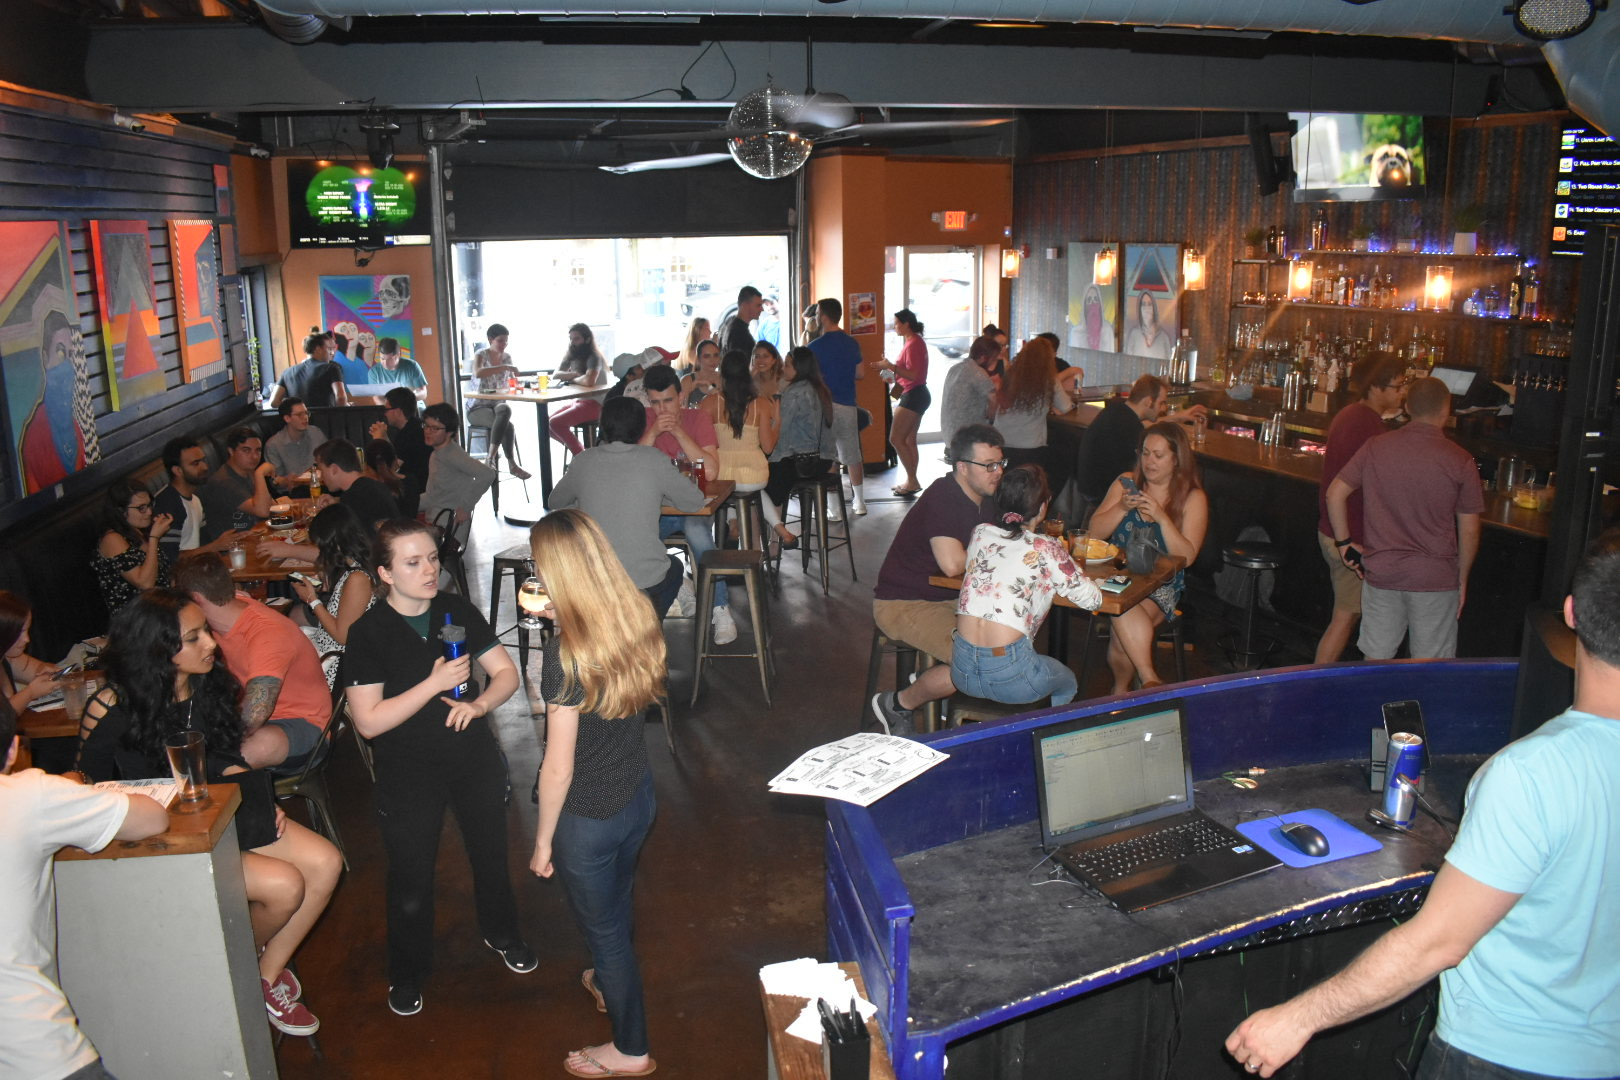 bar crowd.JPG